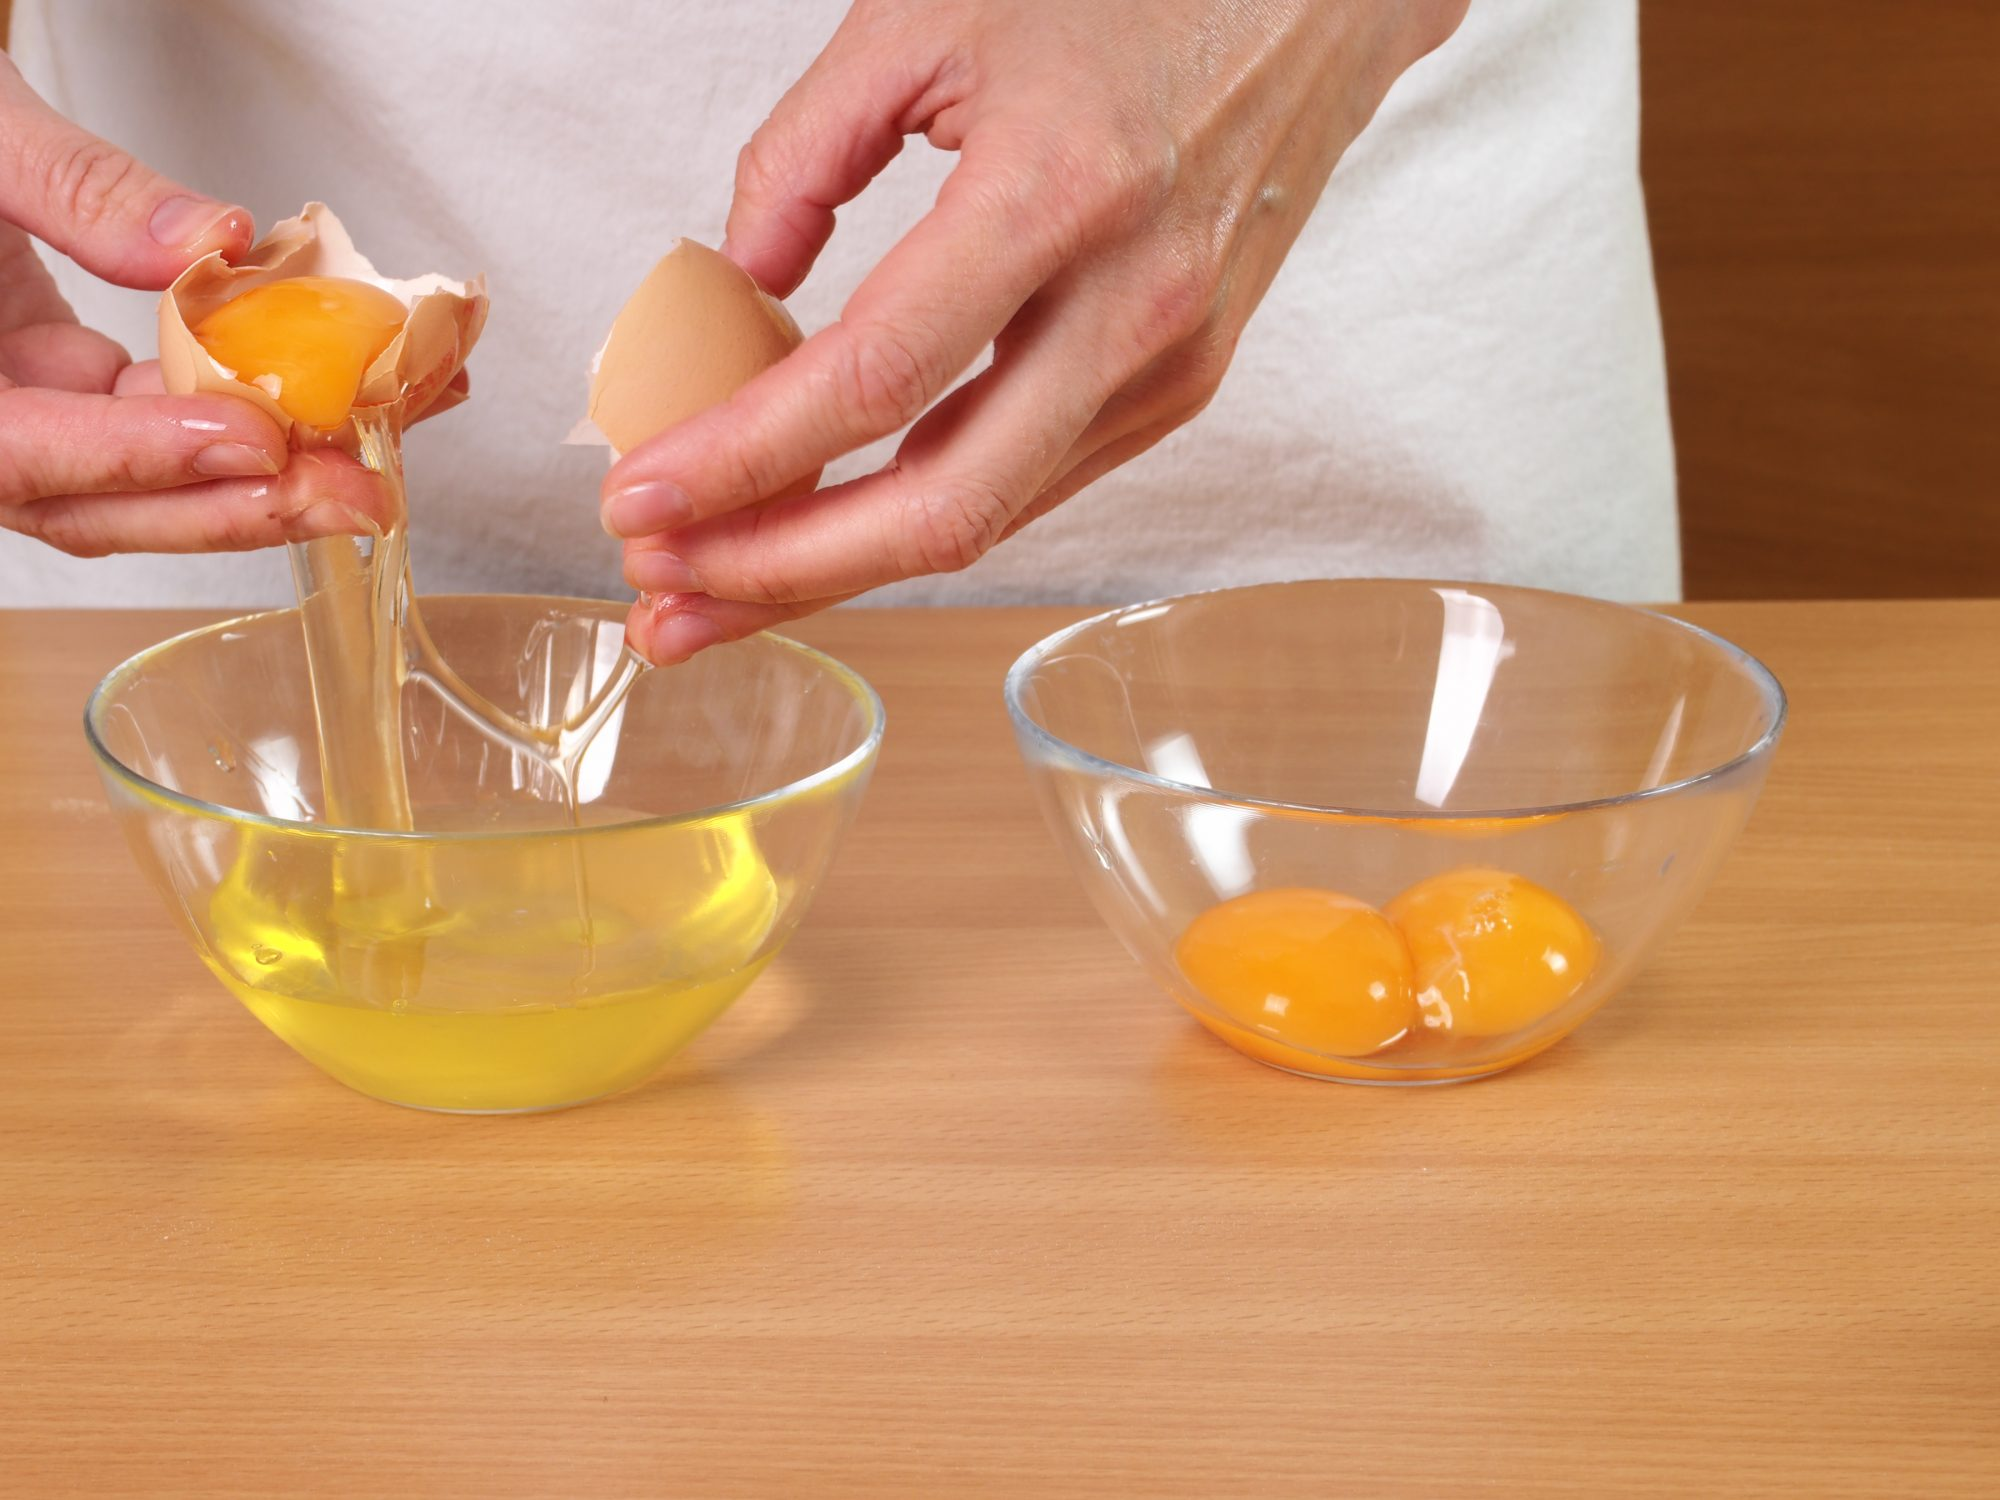 Egg whites Getty 3/26/20